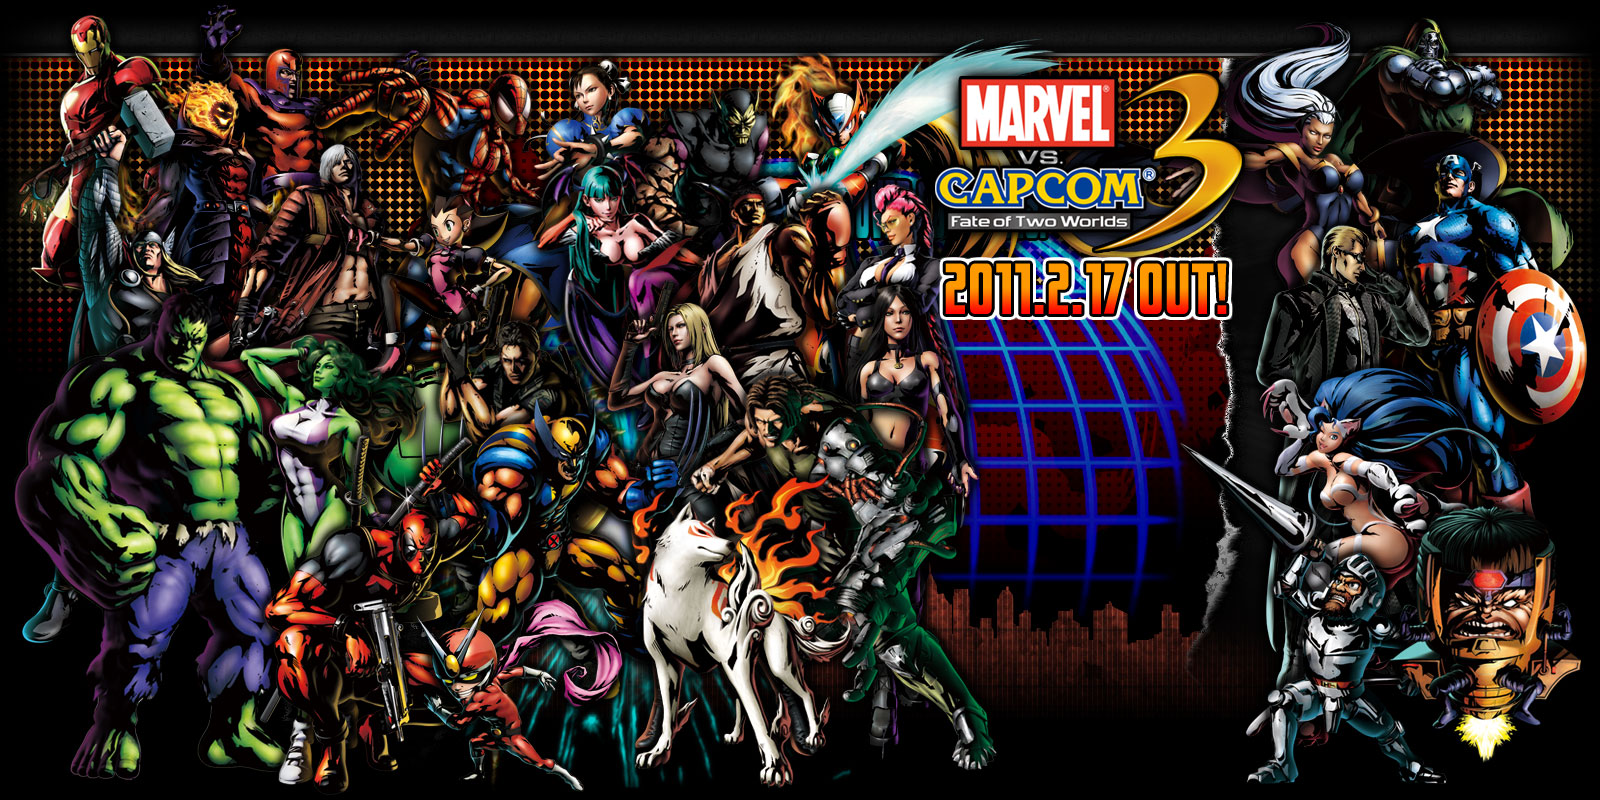 Desktop Wallpaper Marvel Vs Capcom 3 Fate Of Two Worlds